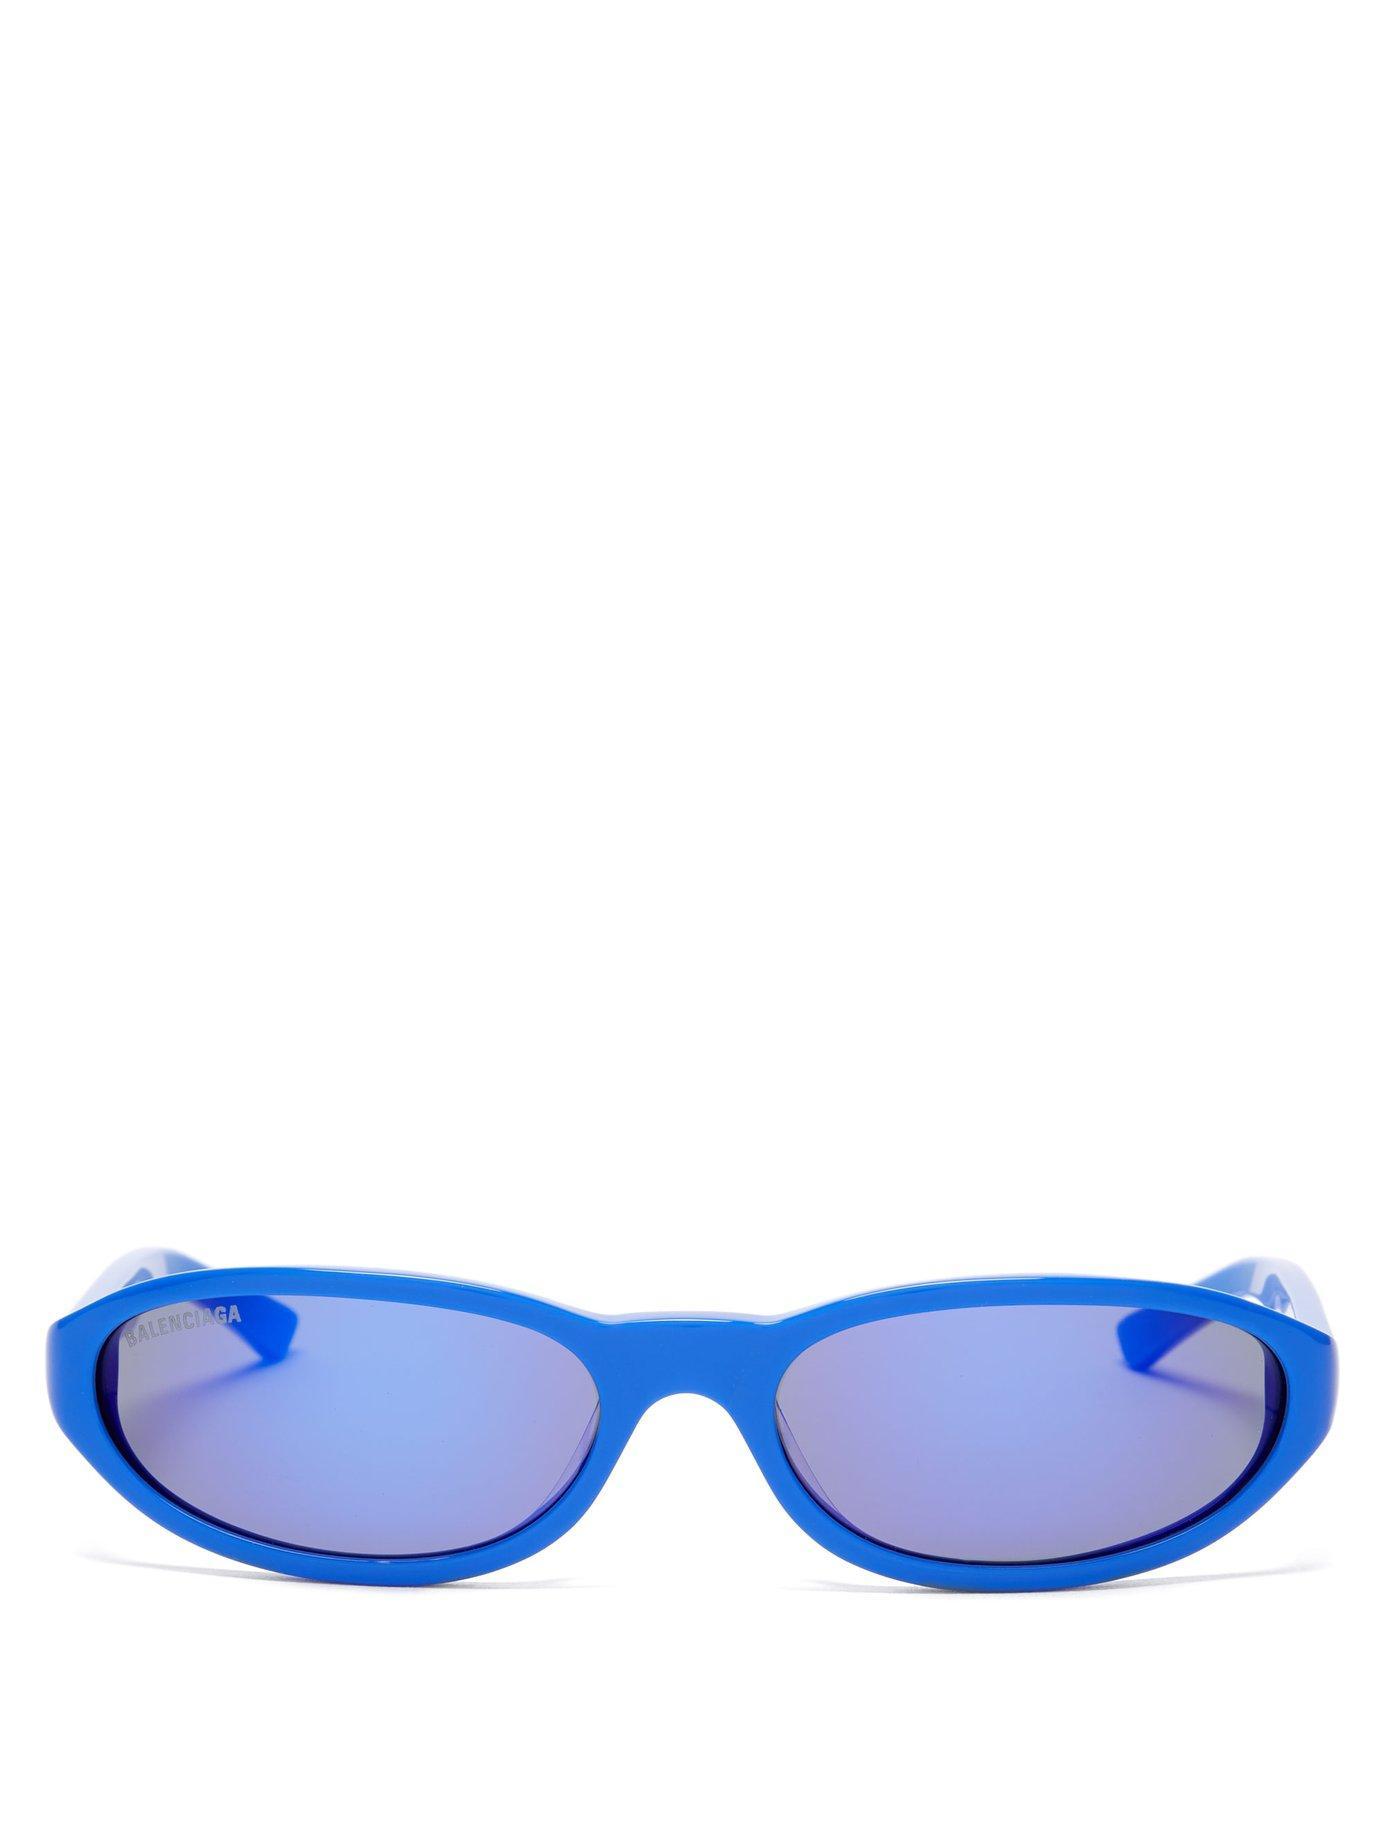 be98b7197be Balenciaga - Blue Neo Oval Frame Acetate Sunglasses for Men - Lyst. View  fullscreen